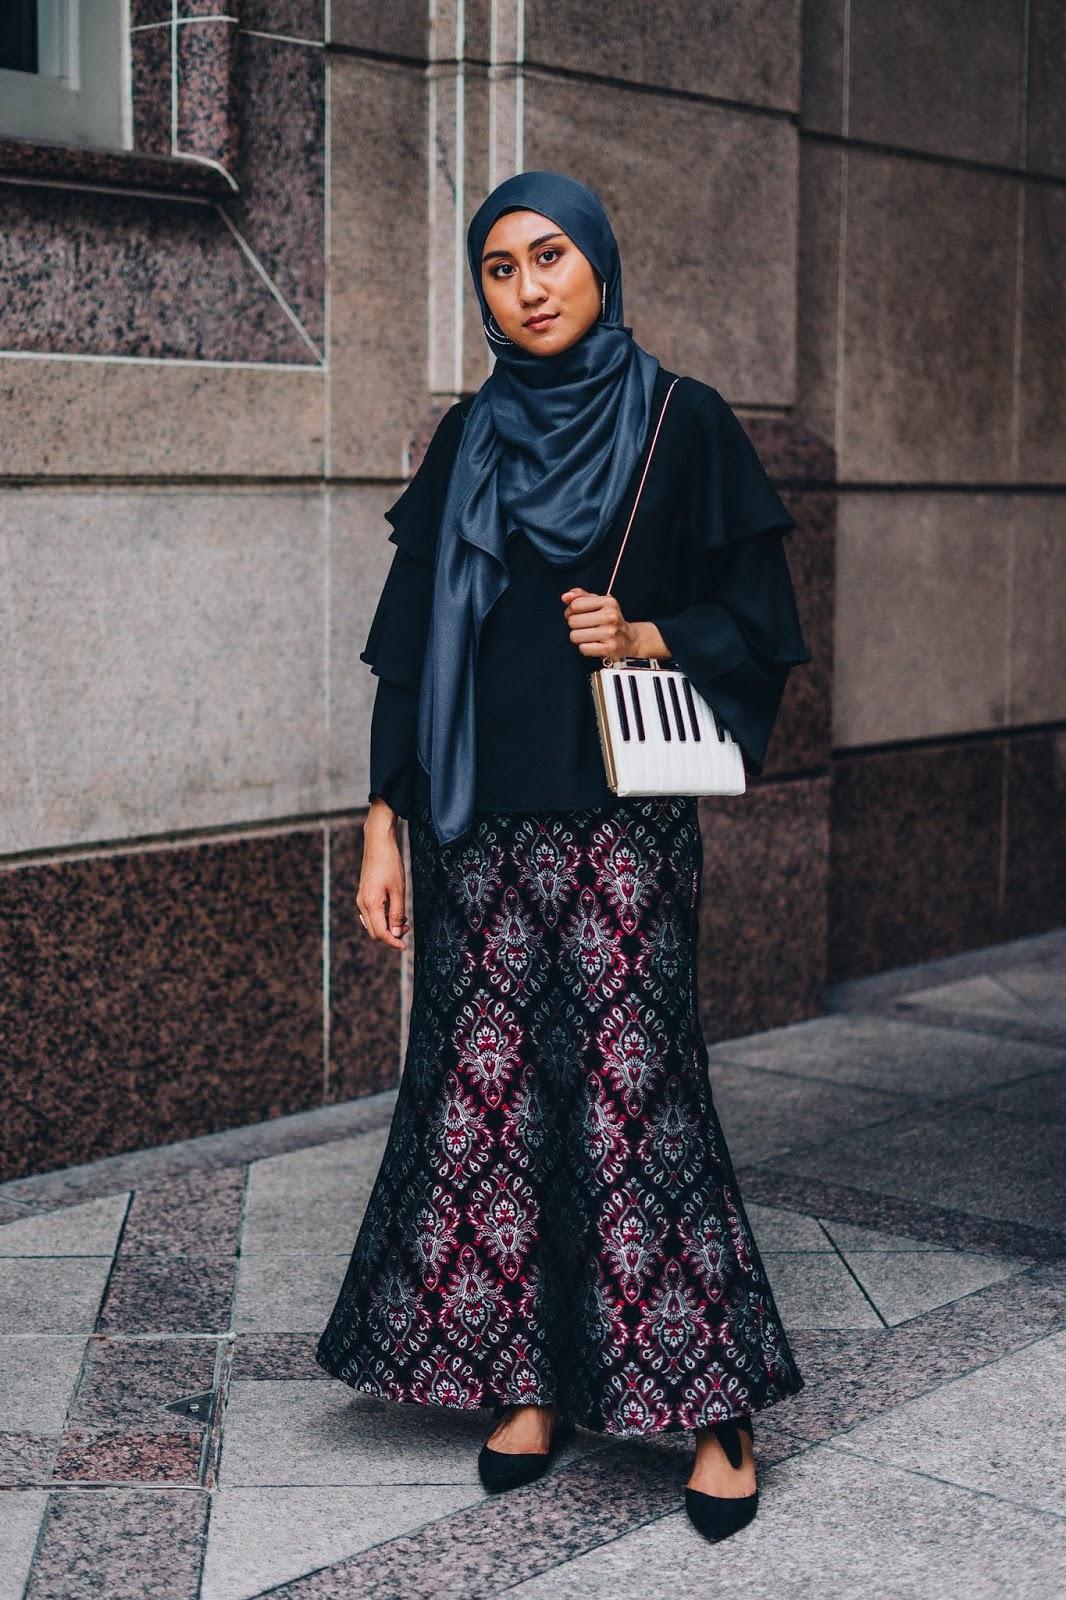 Malaysia traditional wear baju kurung tiered sleeves top songket kate spade  piano clutch jpg 1066x1600 Modern 24e6b6553f